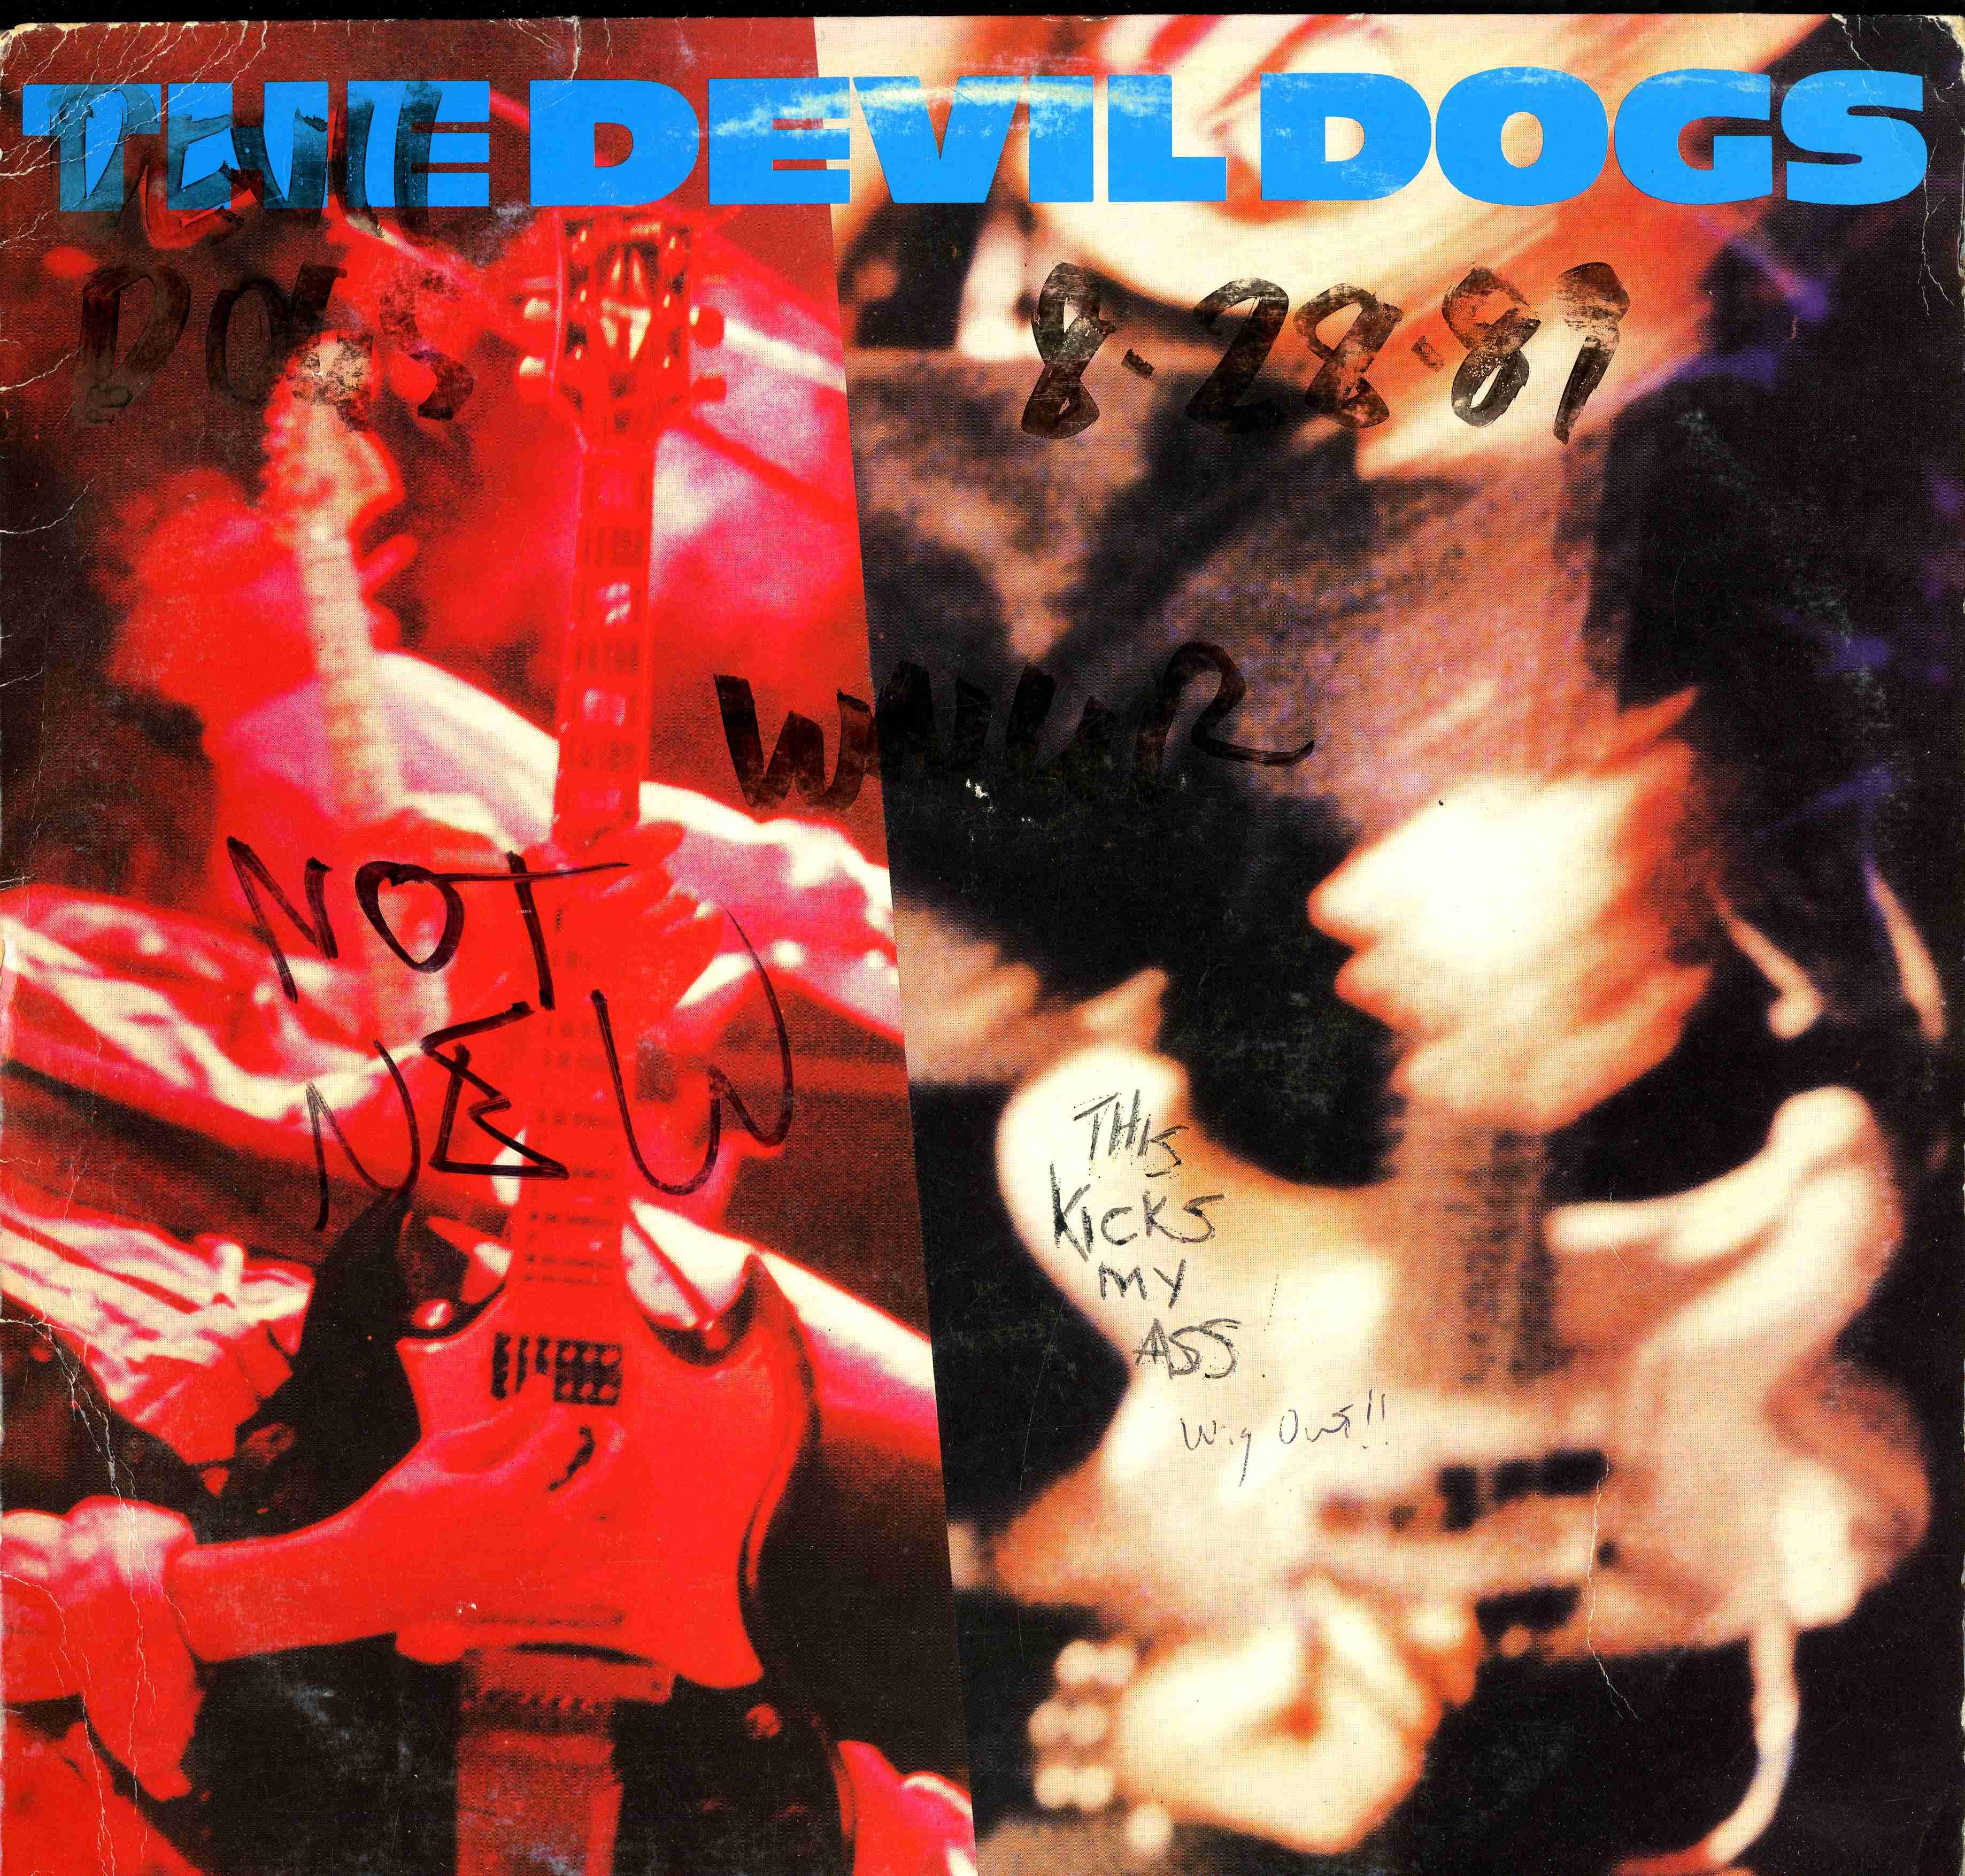 the devil dogs042.jpg